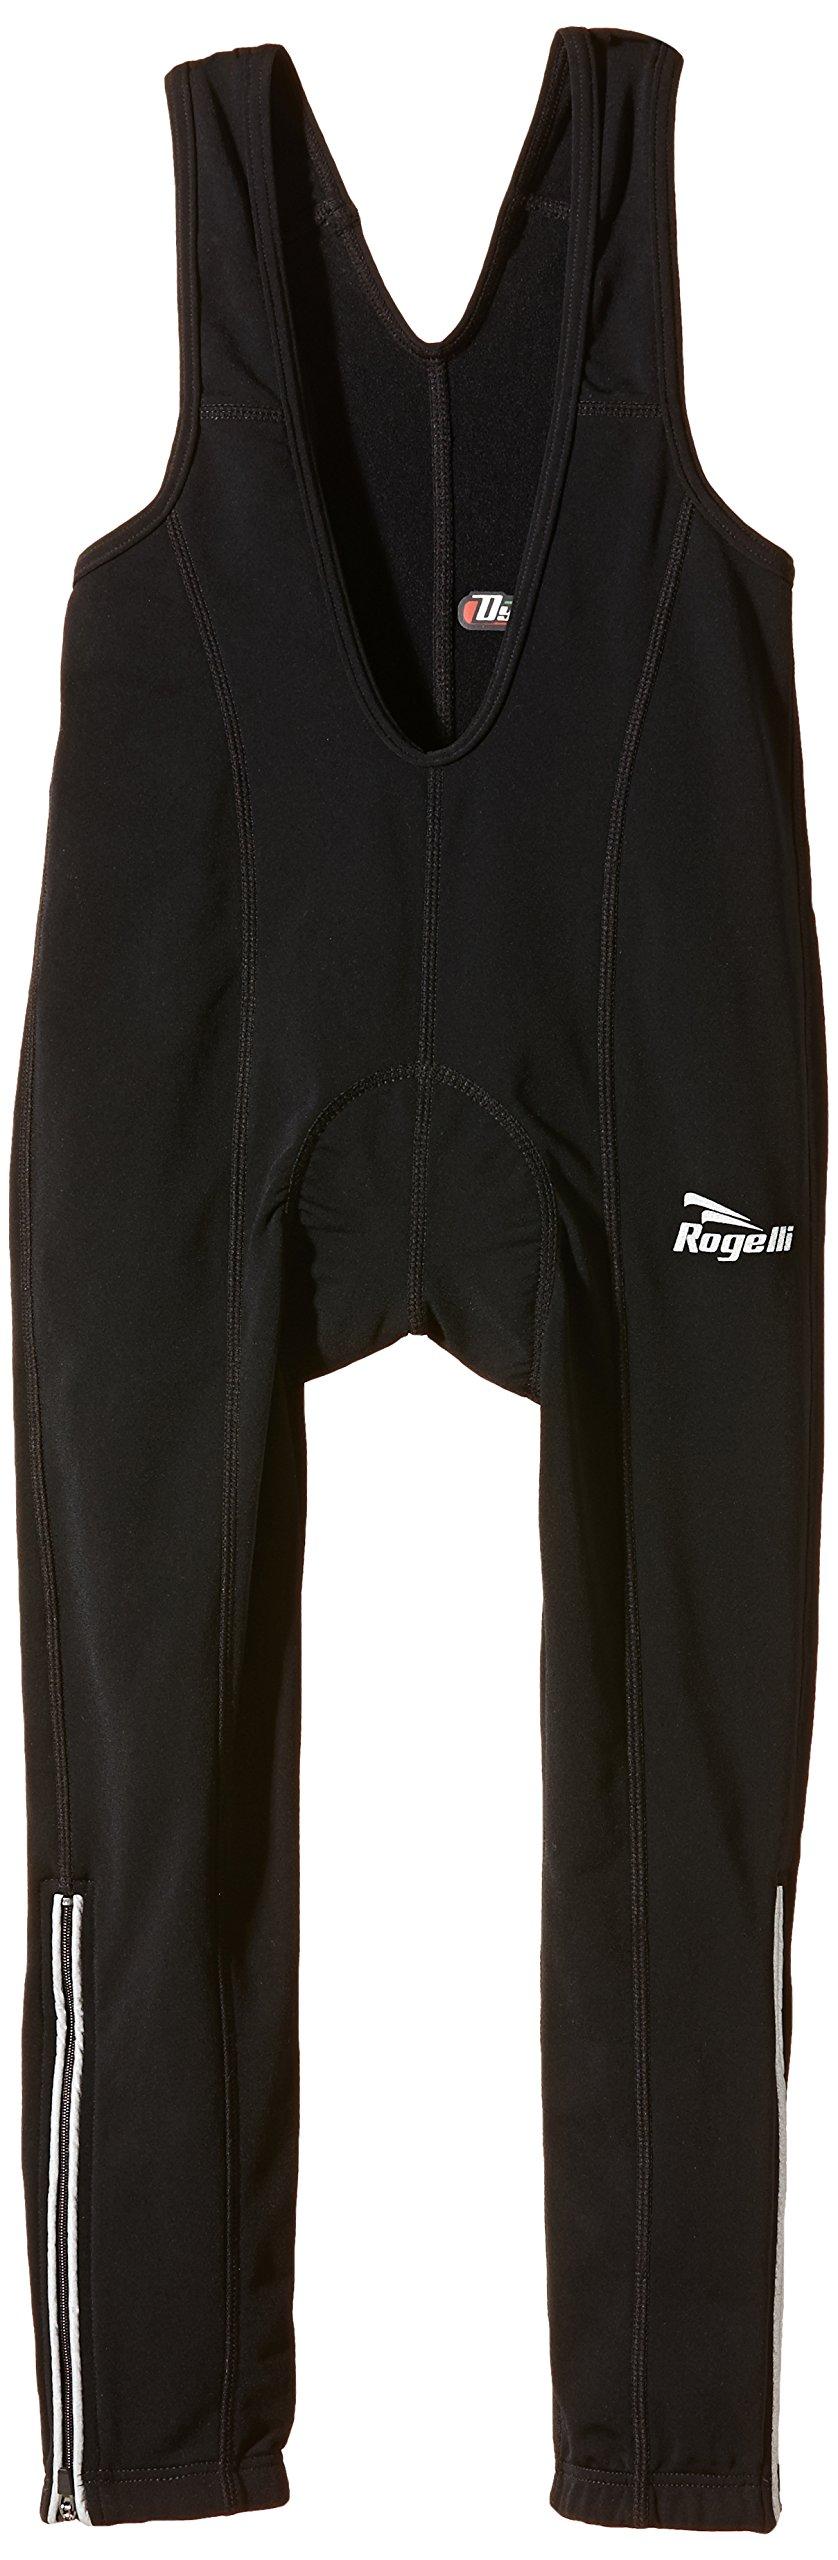 Rogelli Kinder Radlerhose lang Tavon, Black, 140/152